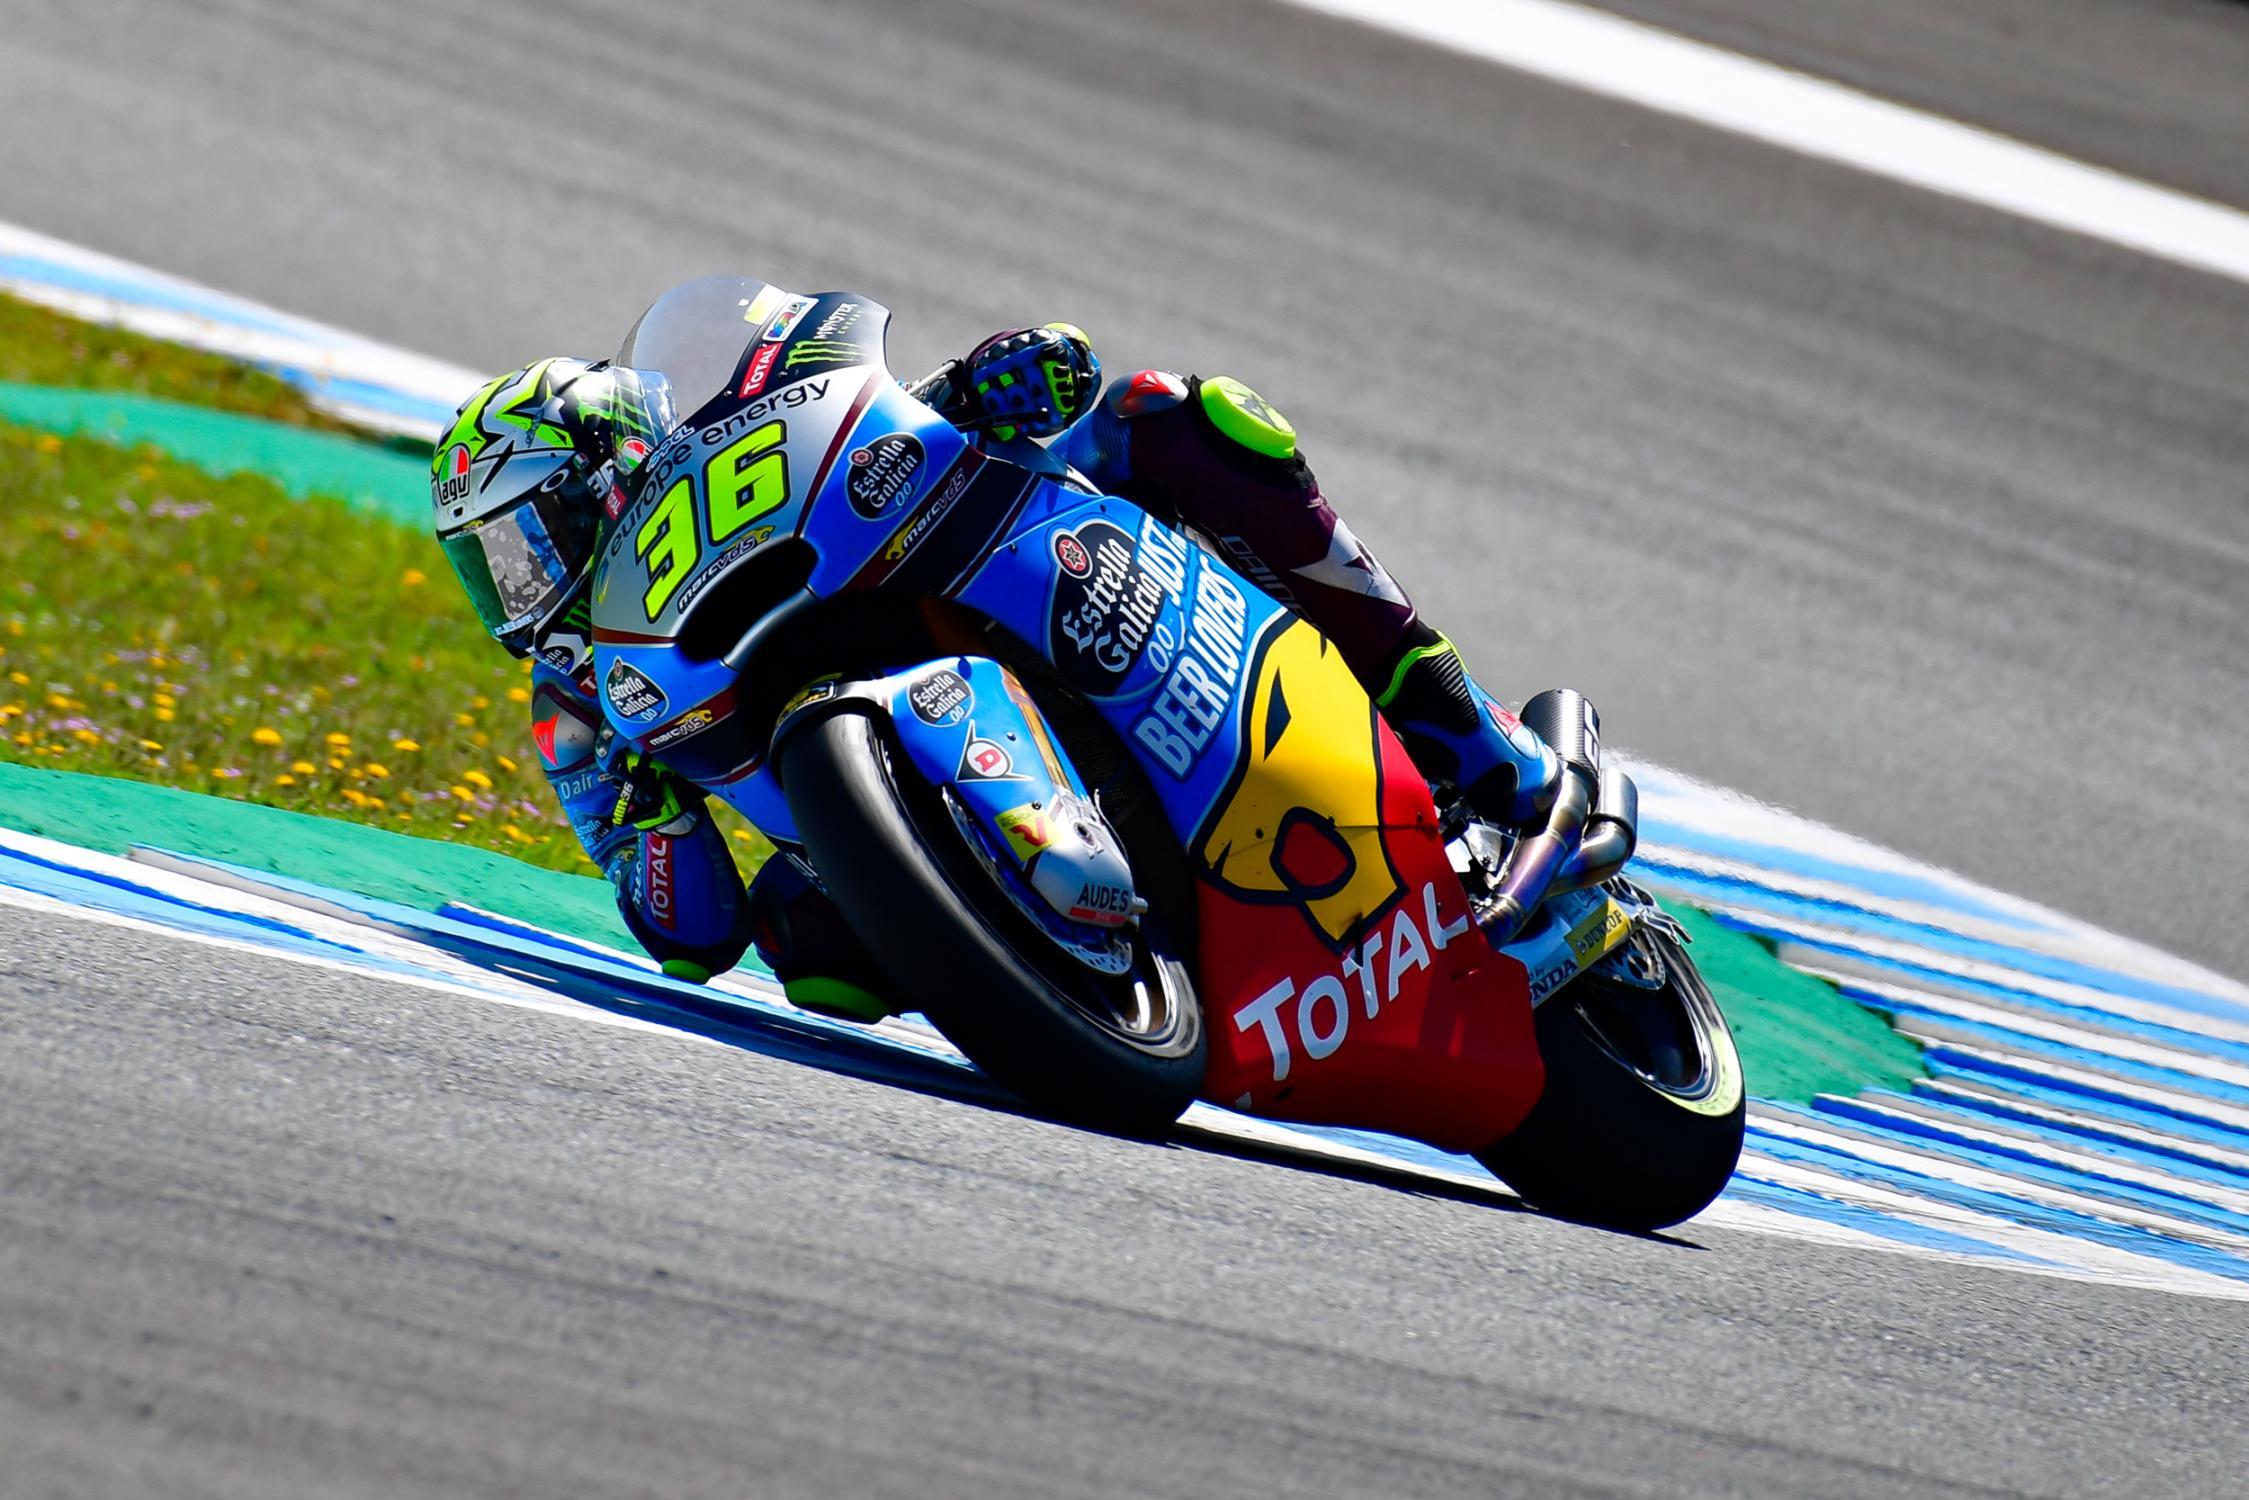 Motosan - Marc Márquez domina la jornada y Ducati se hunde